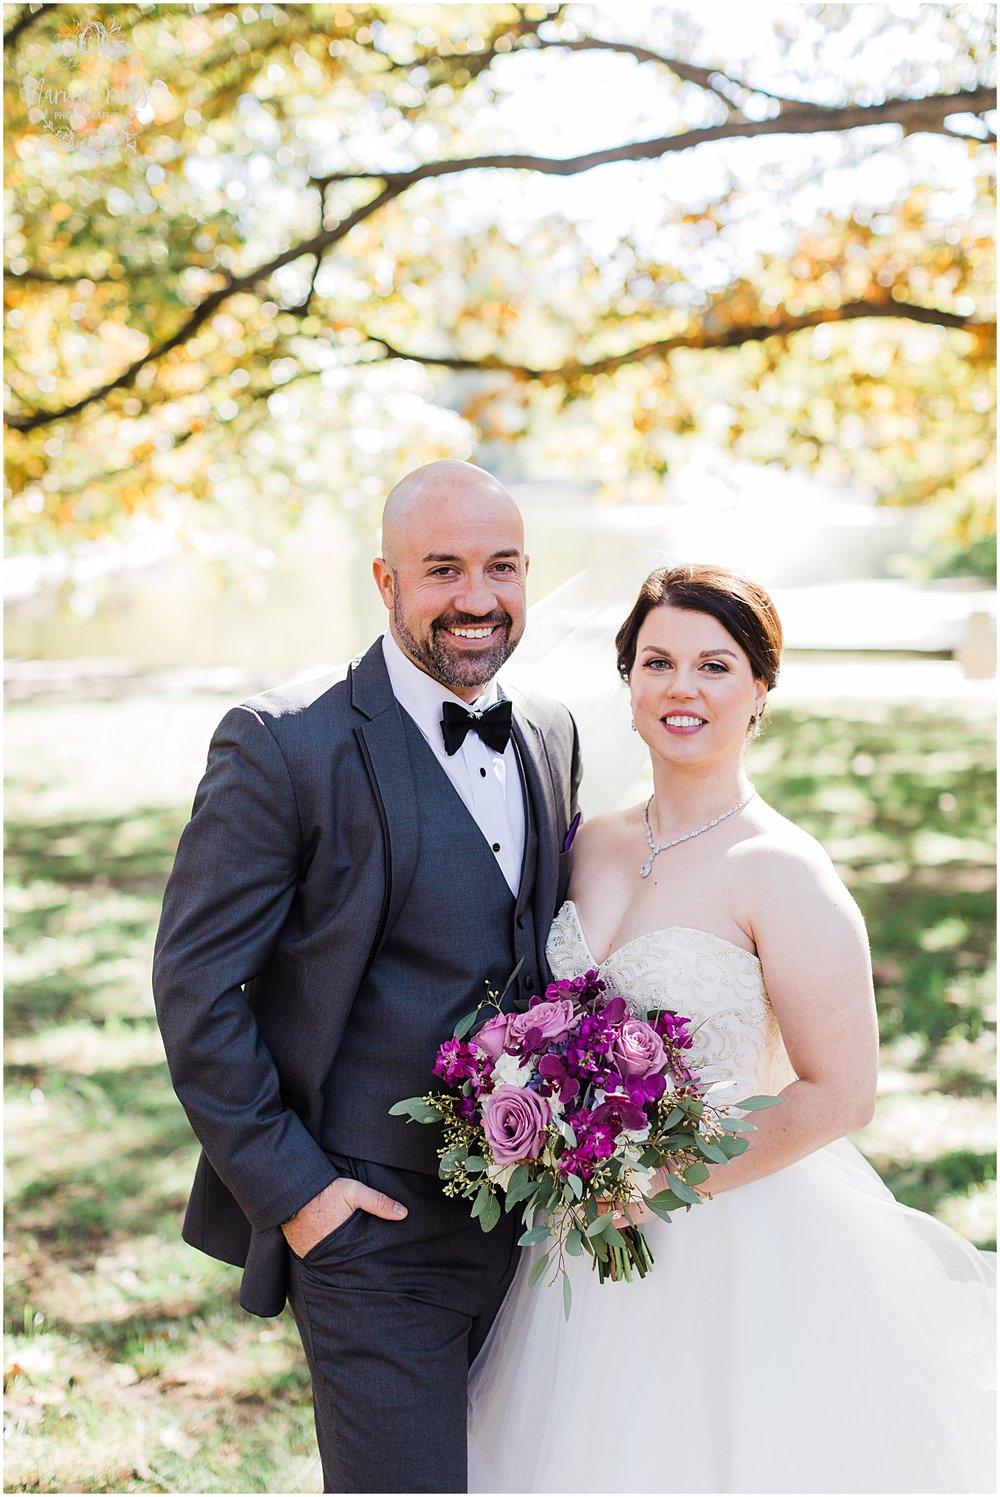 LAURA & DAN MARRIED | NELSON ATKINS MUSEUM | MARISSA CRIBBS PHOTOGRAPHY_7008.jpg